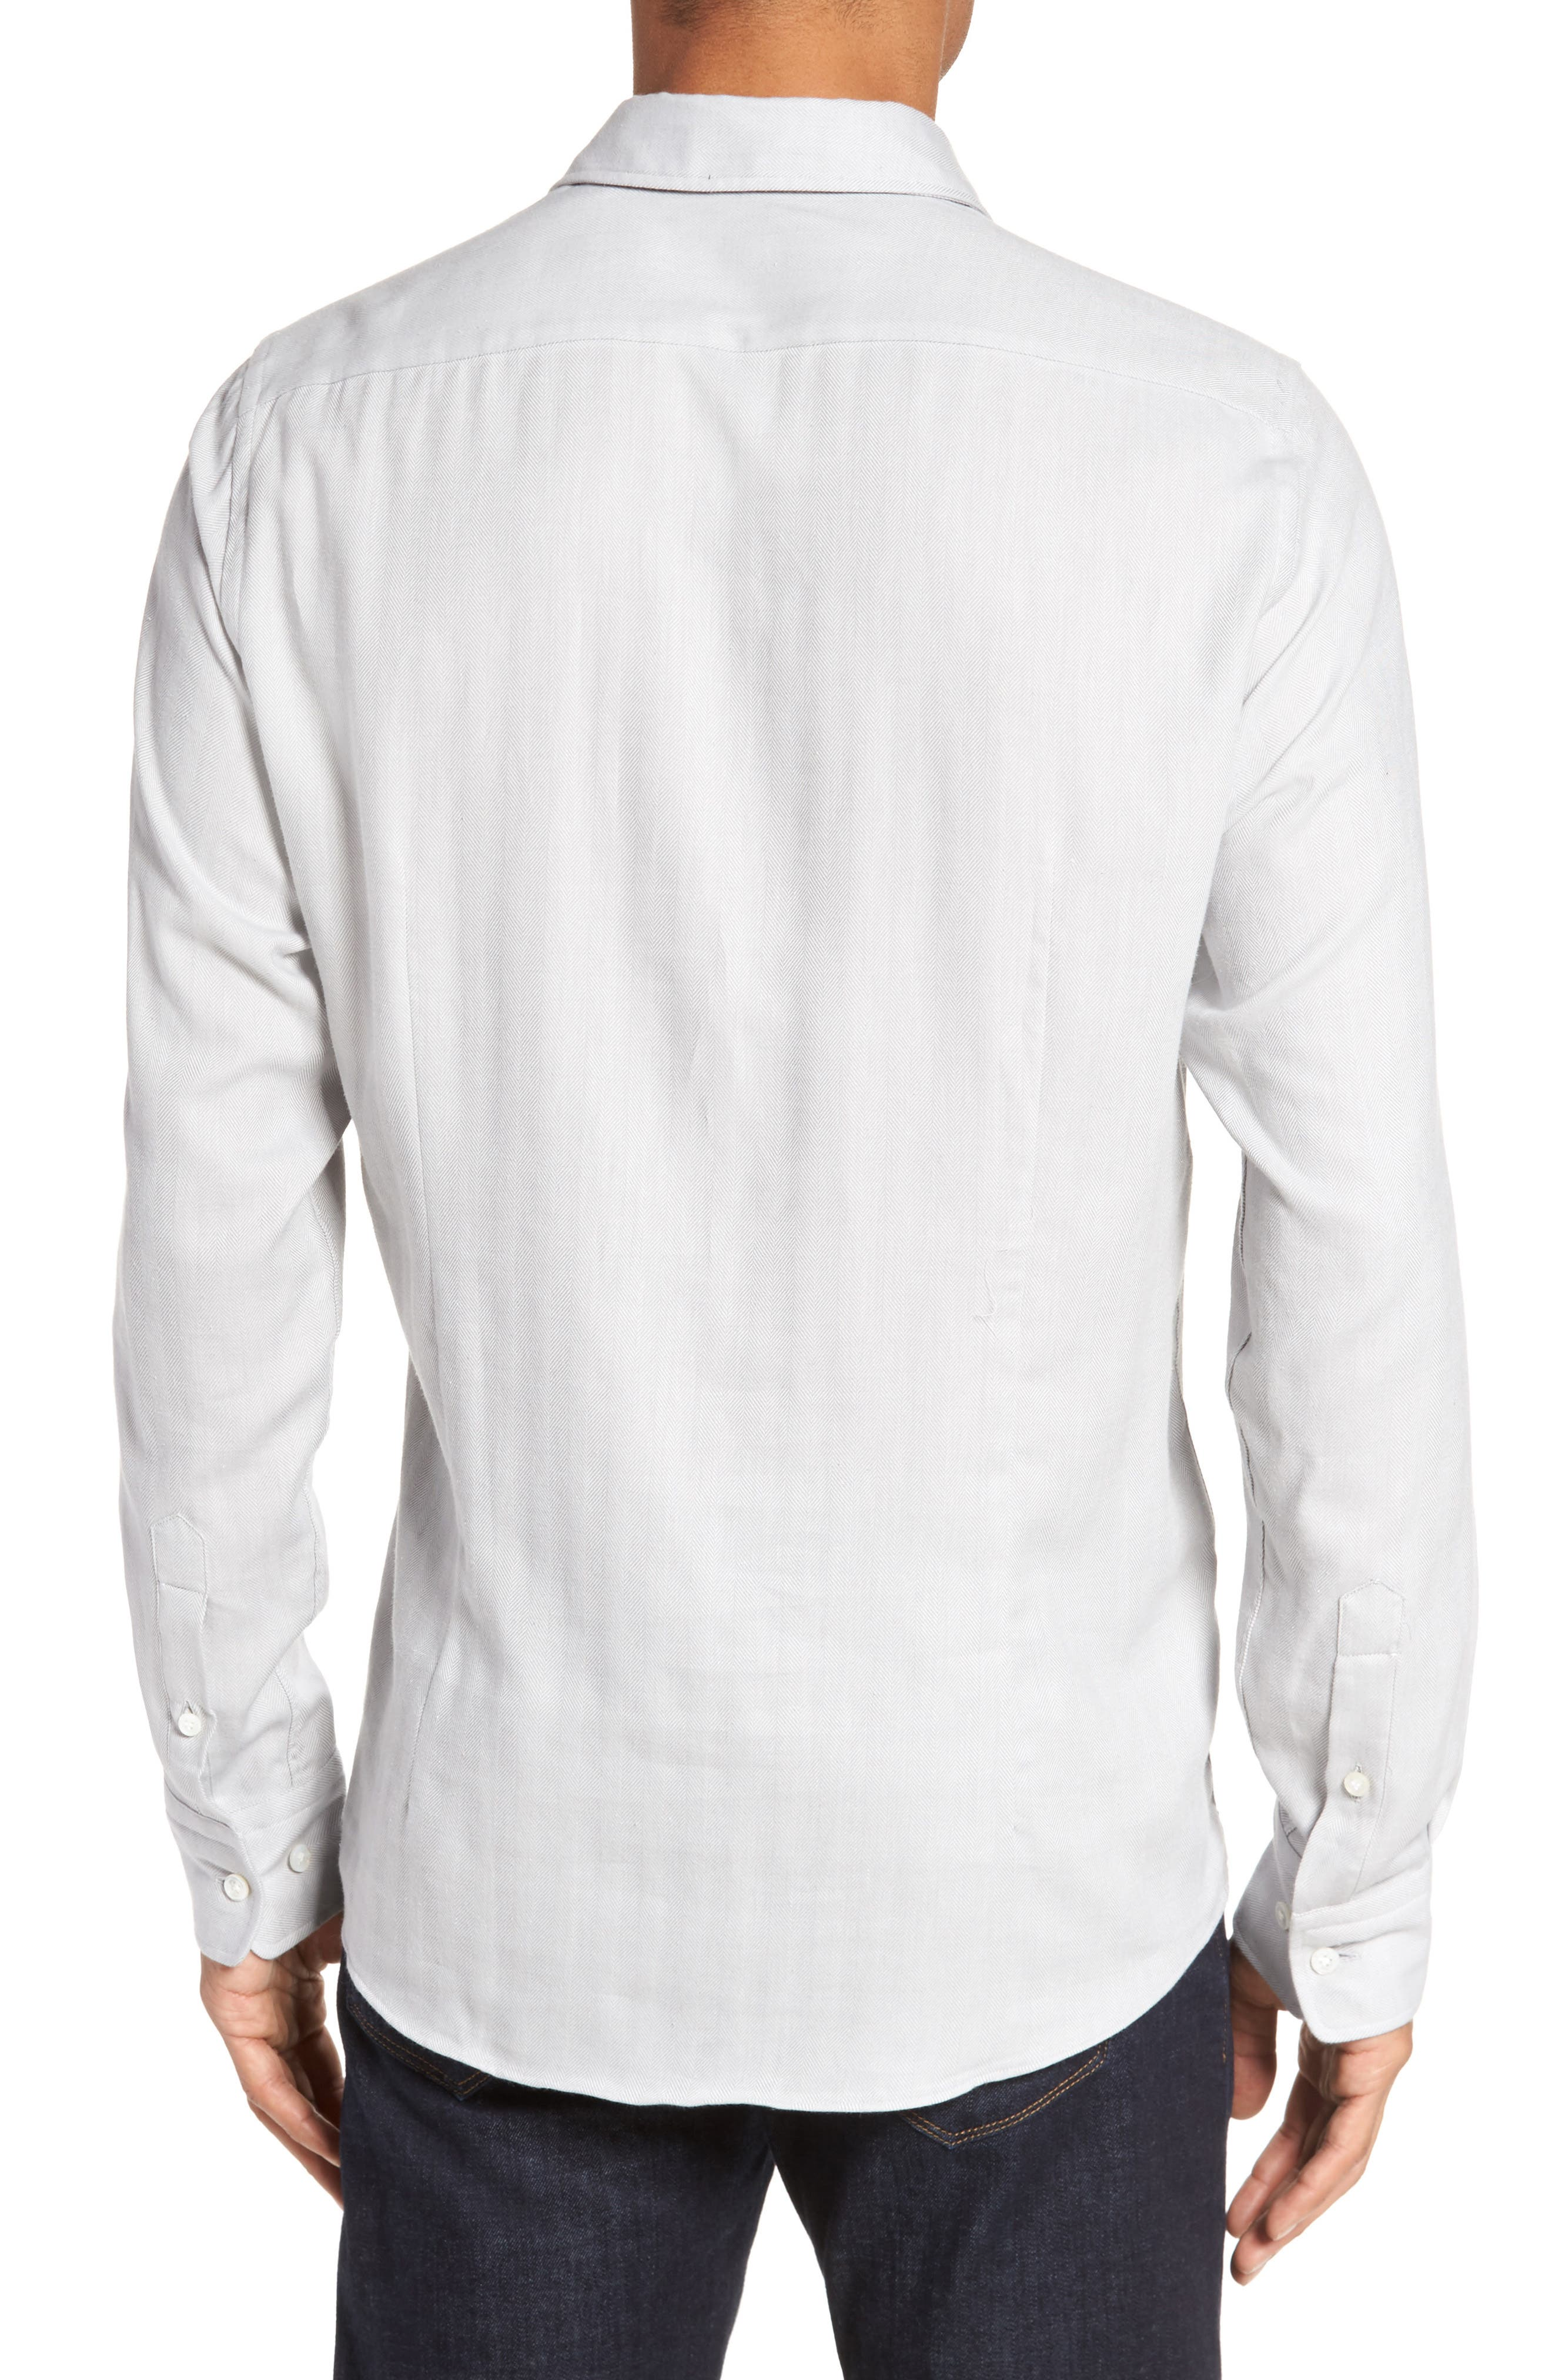 Landon Herringbone Shirt,                             Alternate thumbnail 2, color,                             Grey